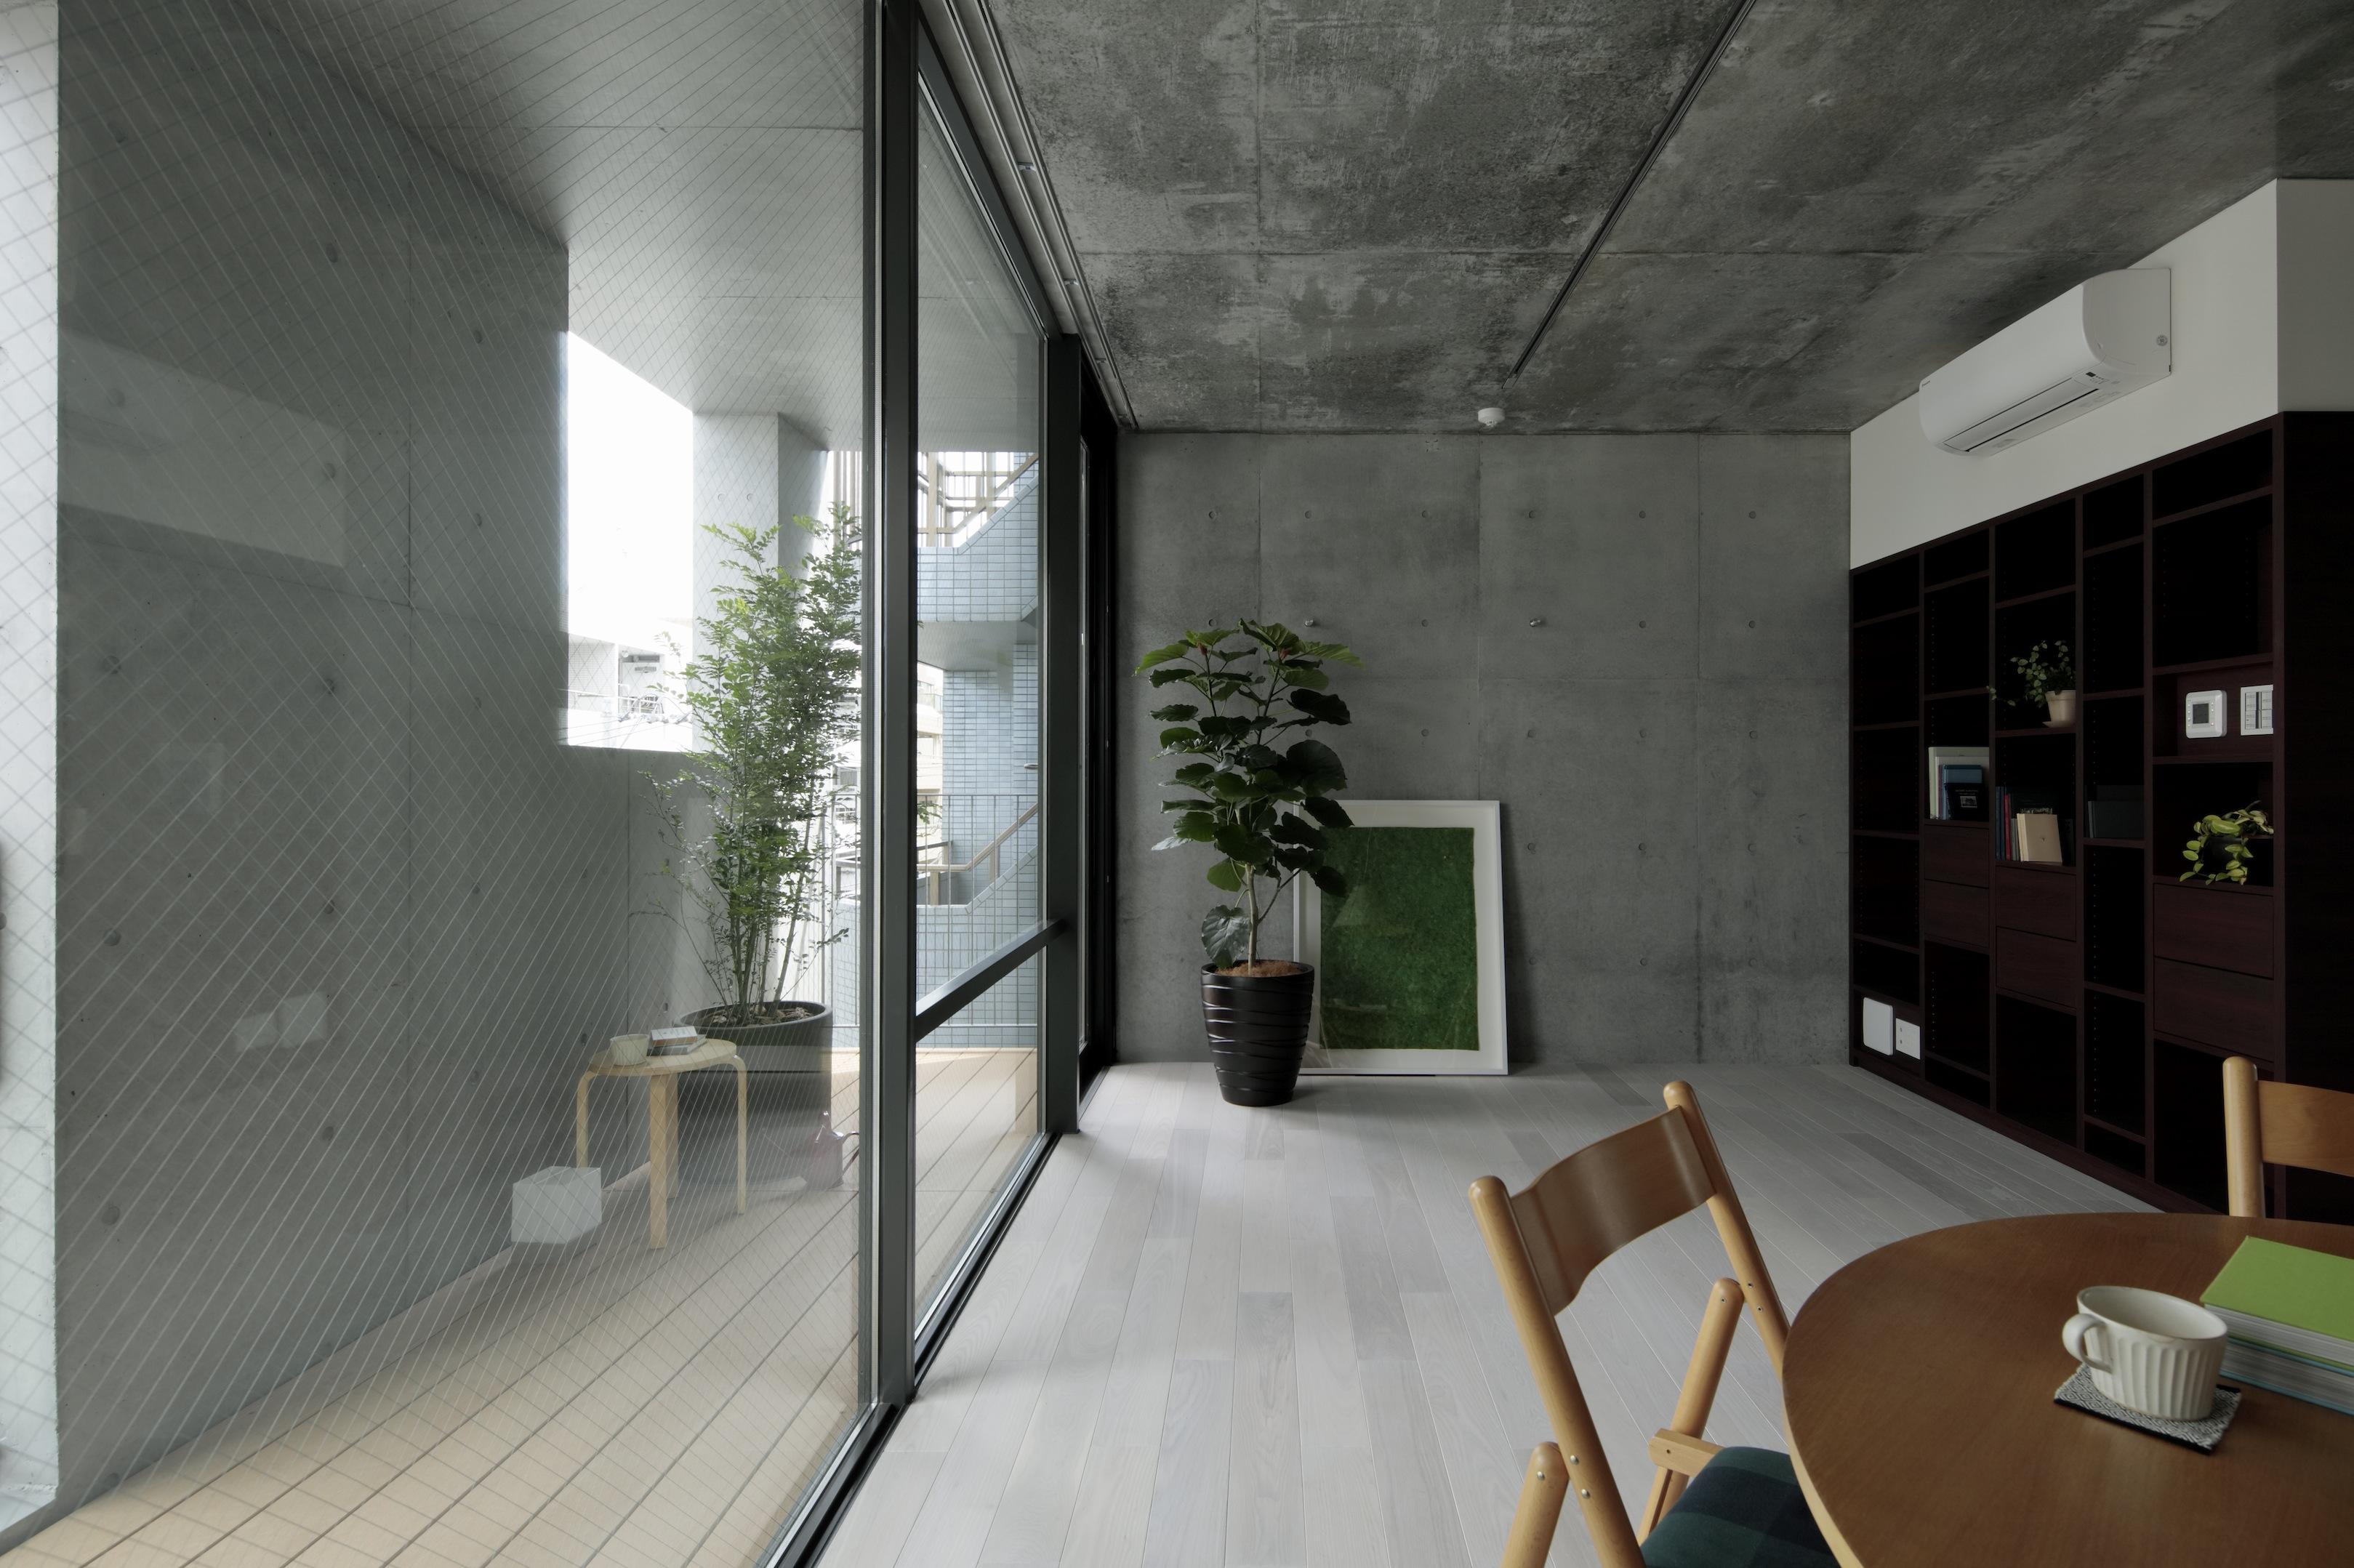 windowgarden_009